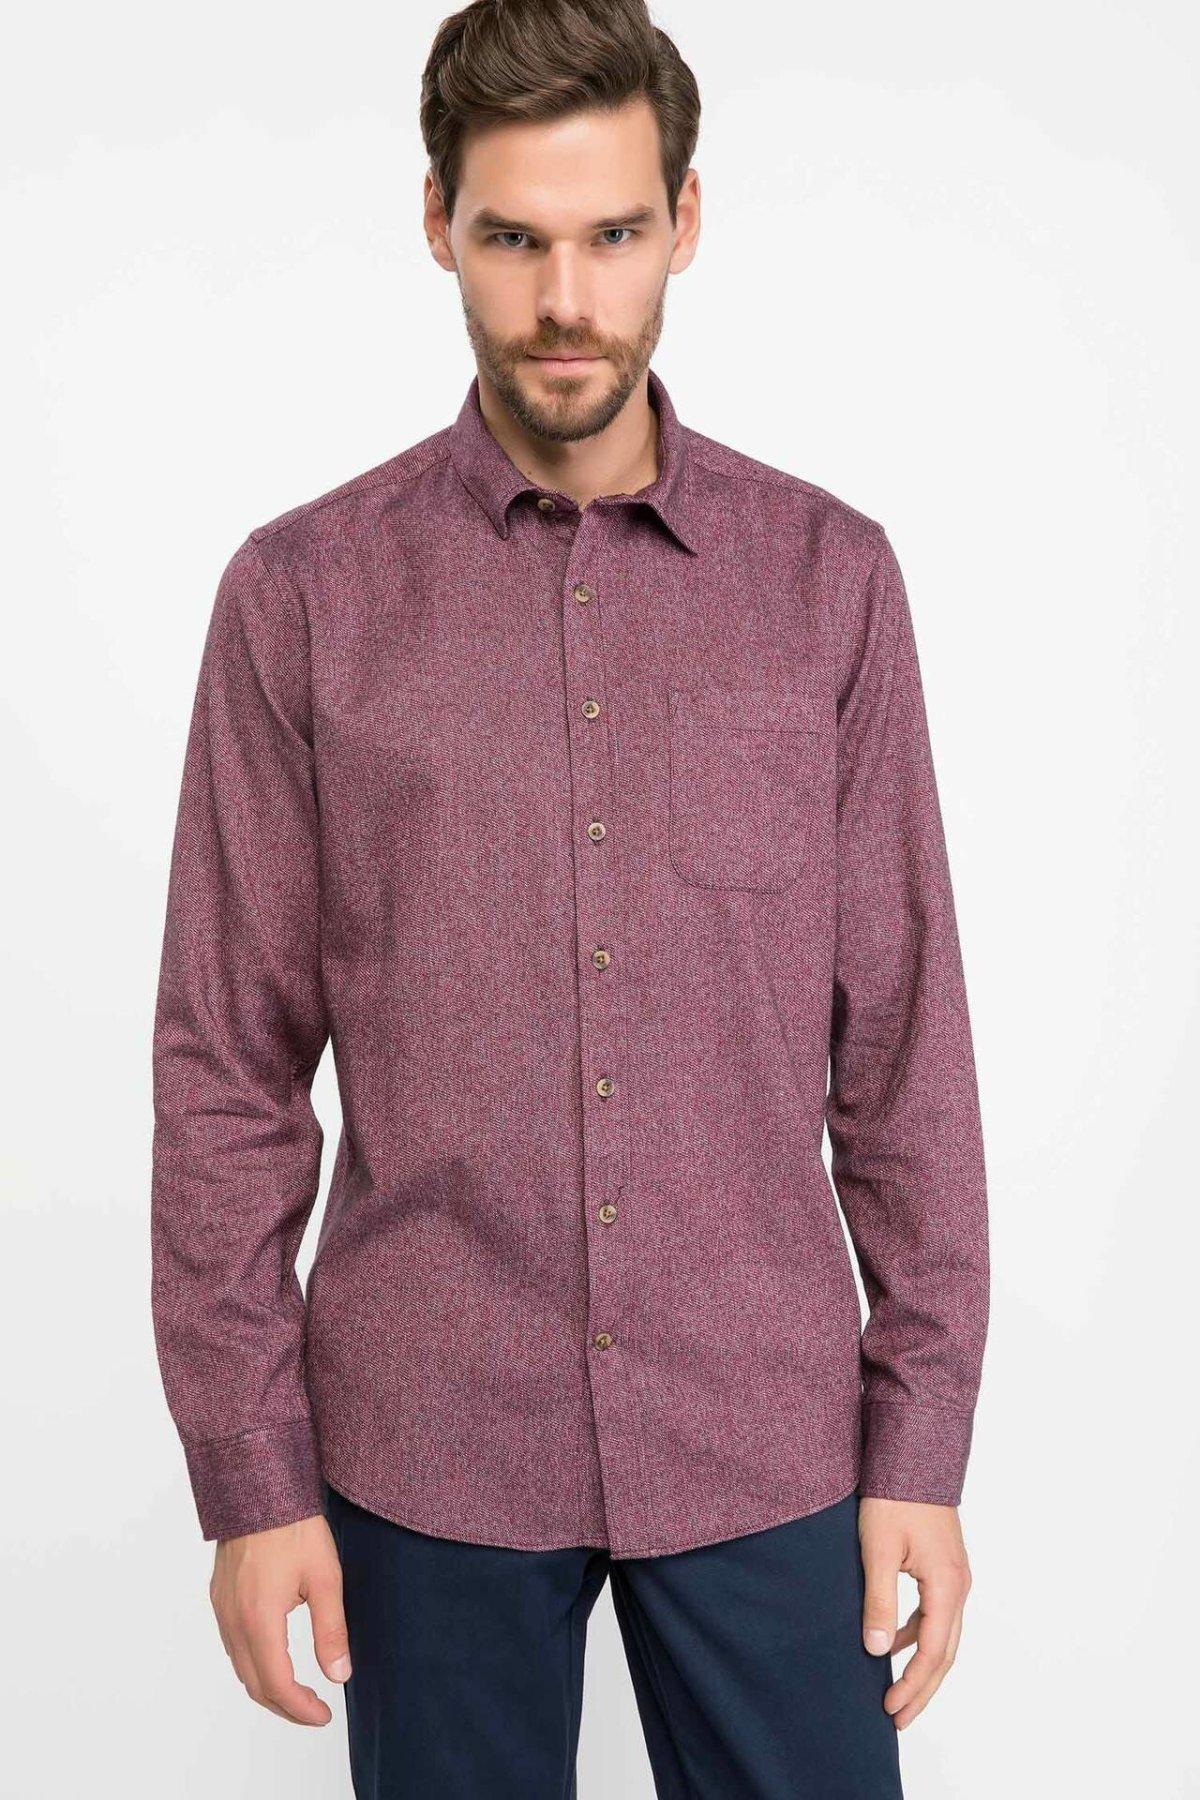 DeFacto Man Purplish Red Color Top Shirts Wome Casual Smart Autumn Winter Long Sleeve Shirt High Quality-J1654AZ18WN